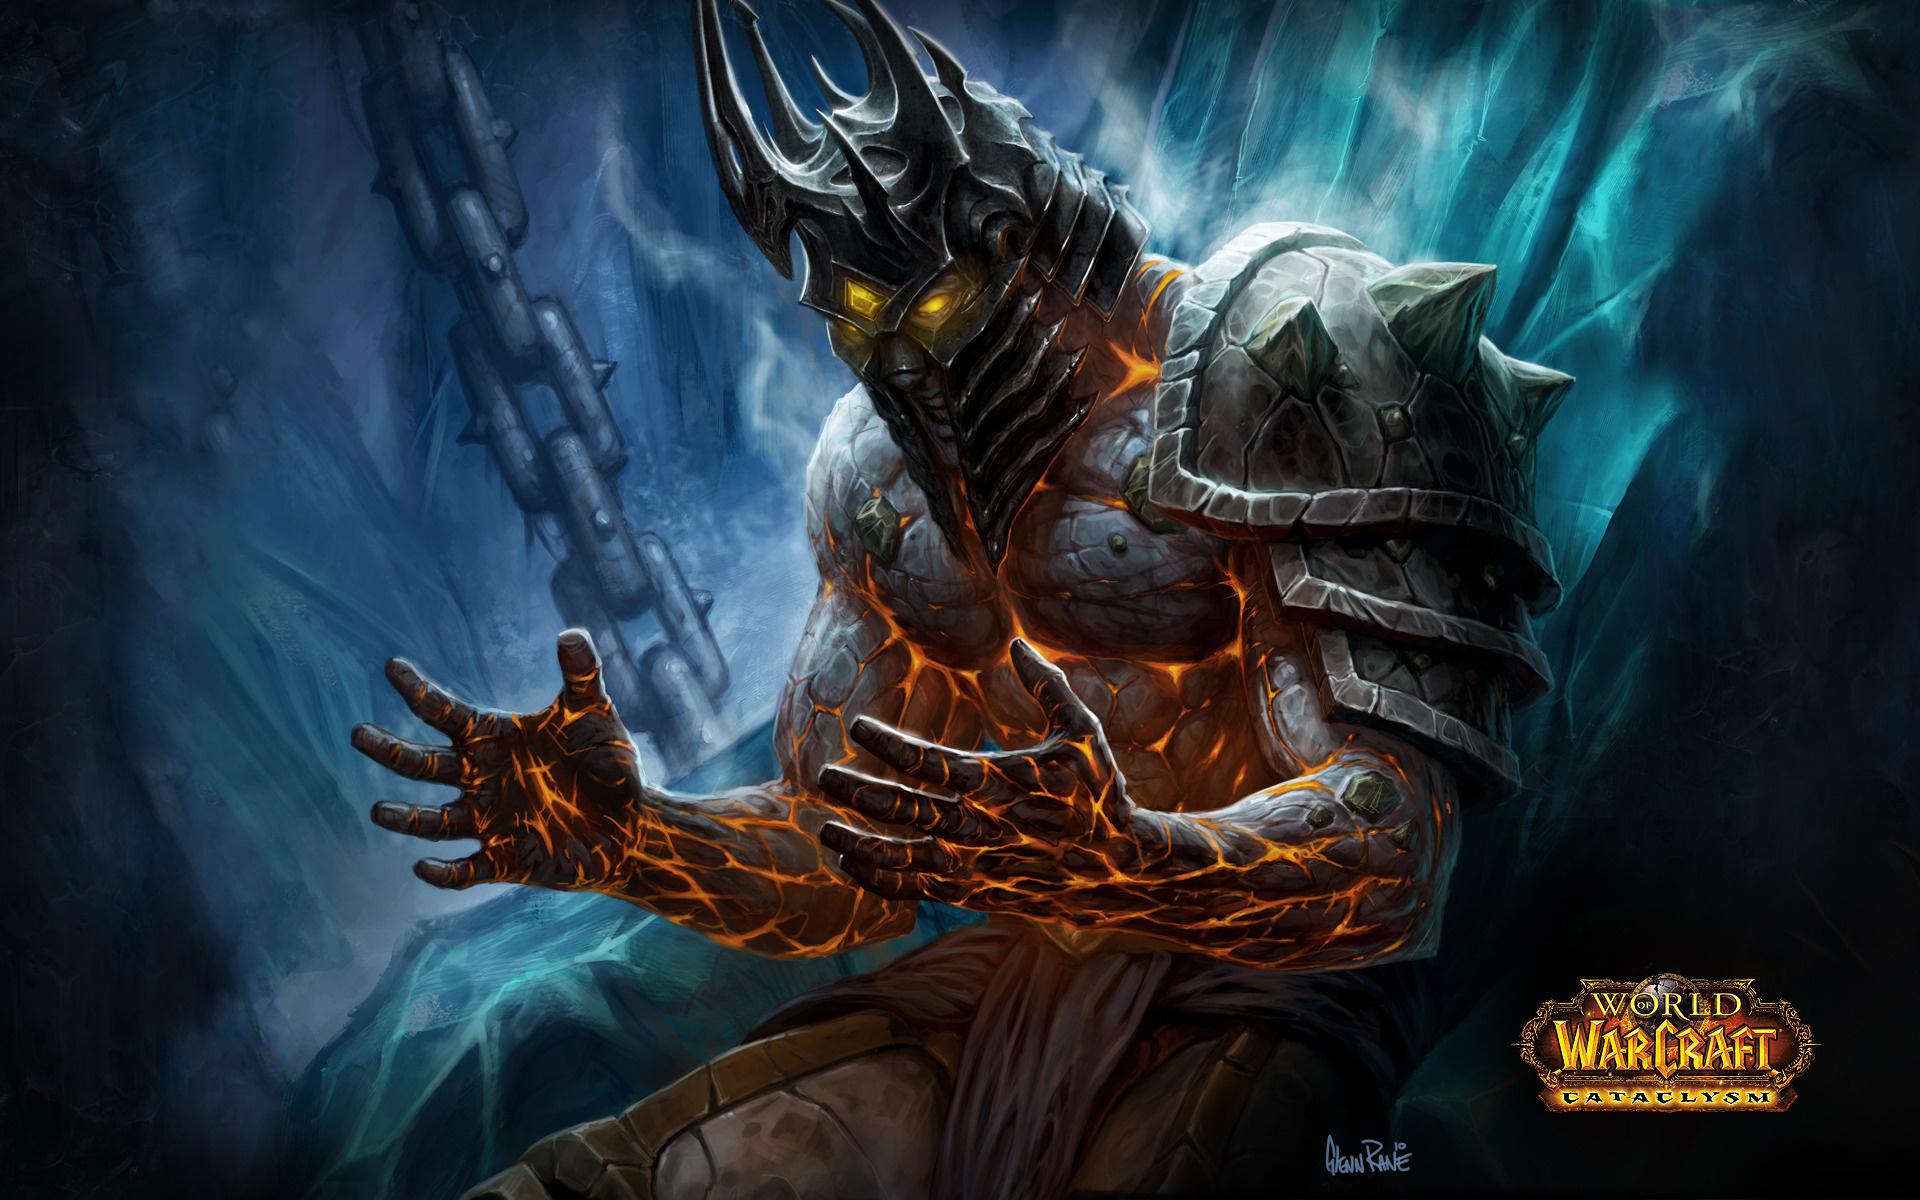 World Of Warcraft Wallpaper Download 7450 Wallpaper Cool 1920x1200